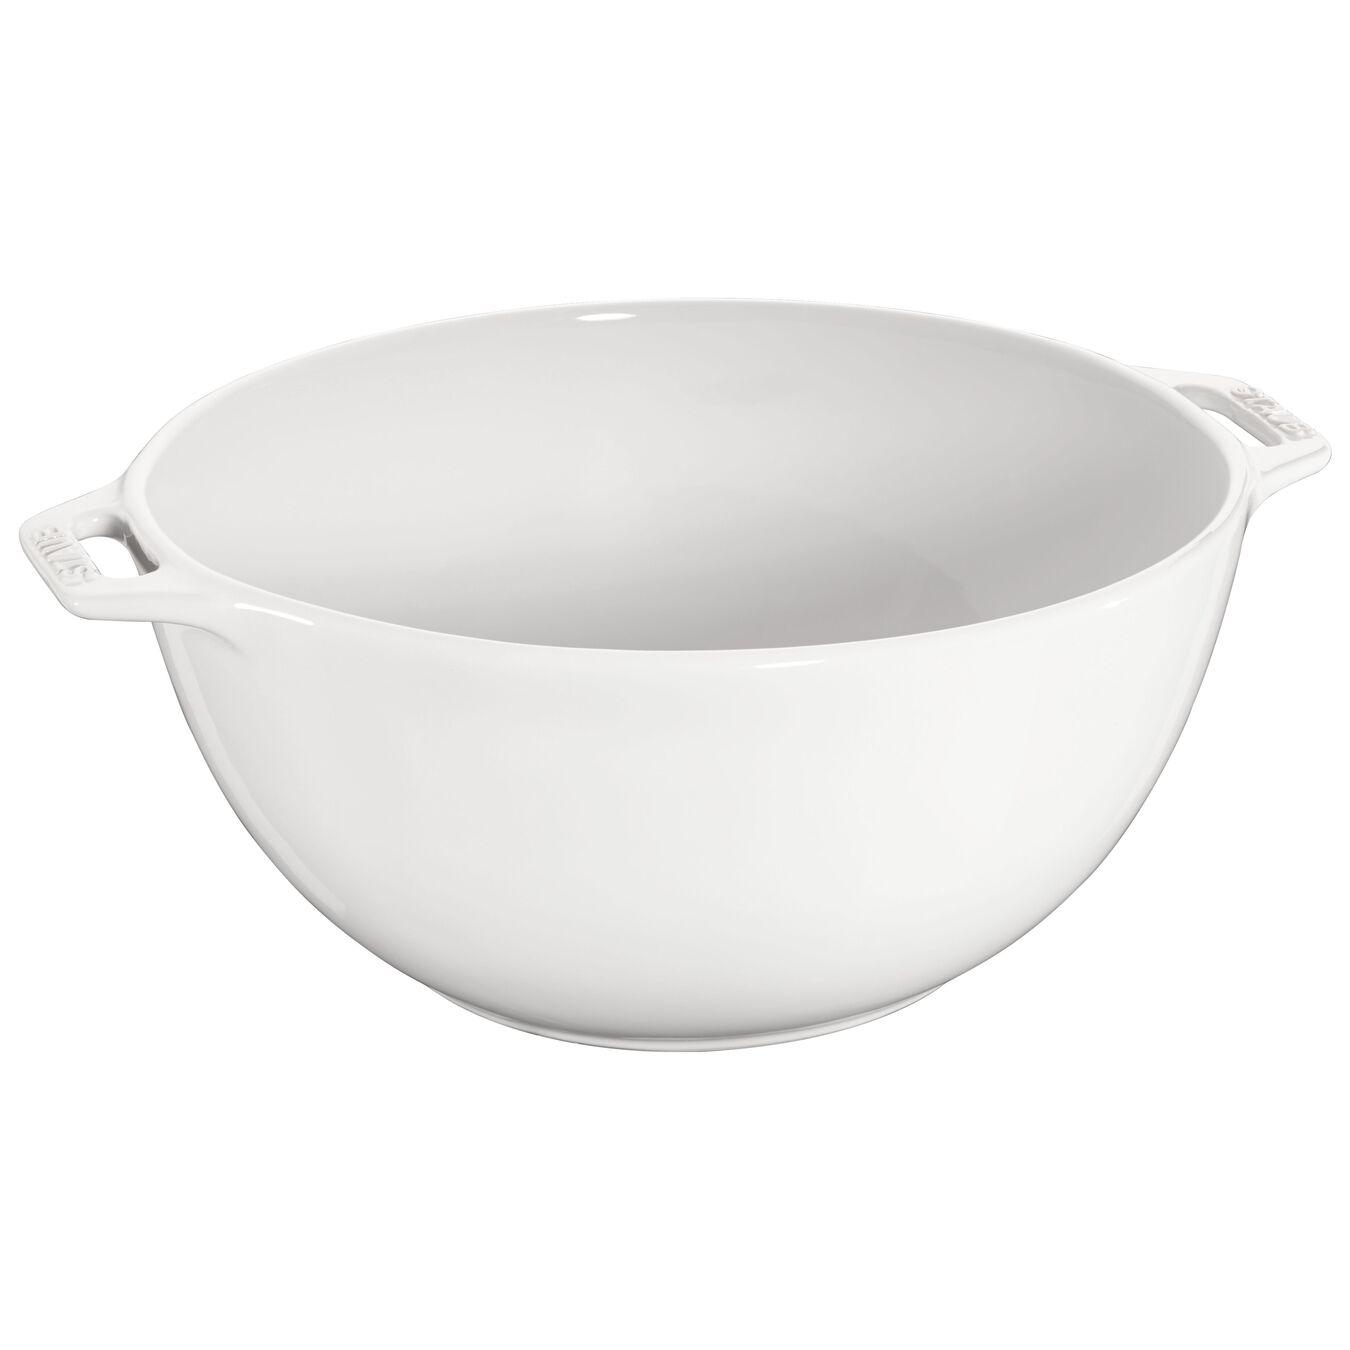 9.5-inch Large Serving Bowl - White,,large 1